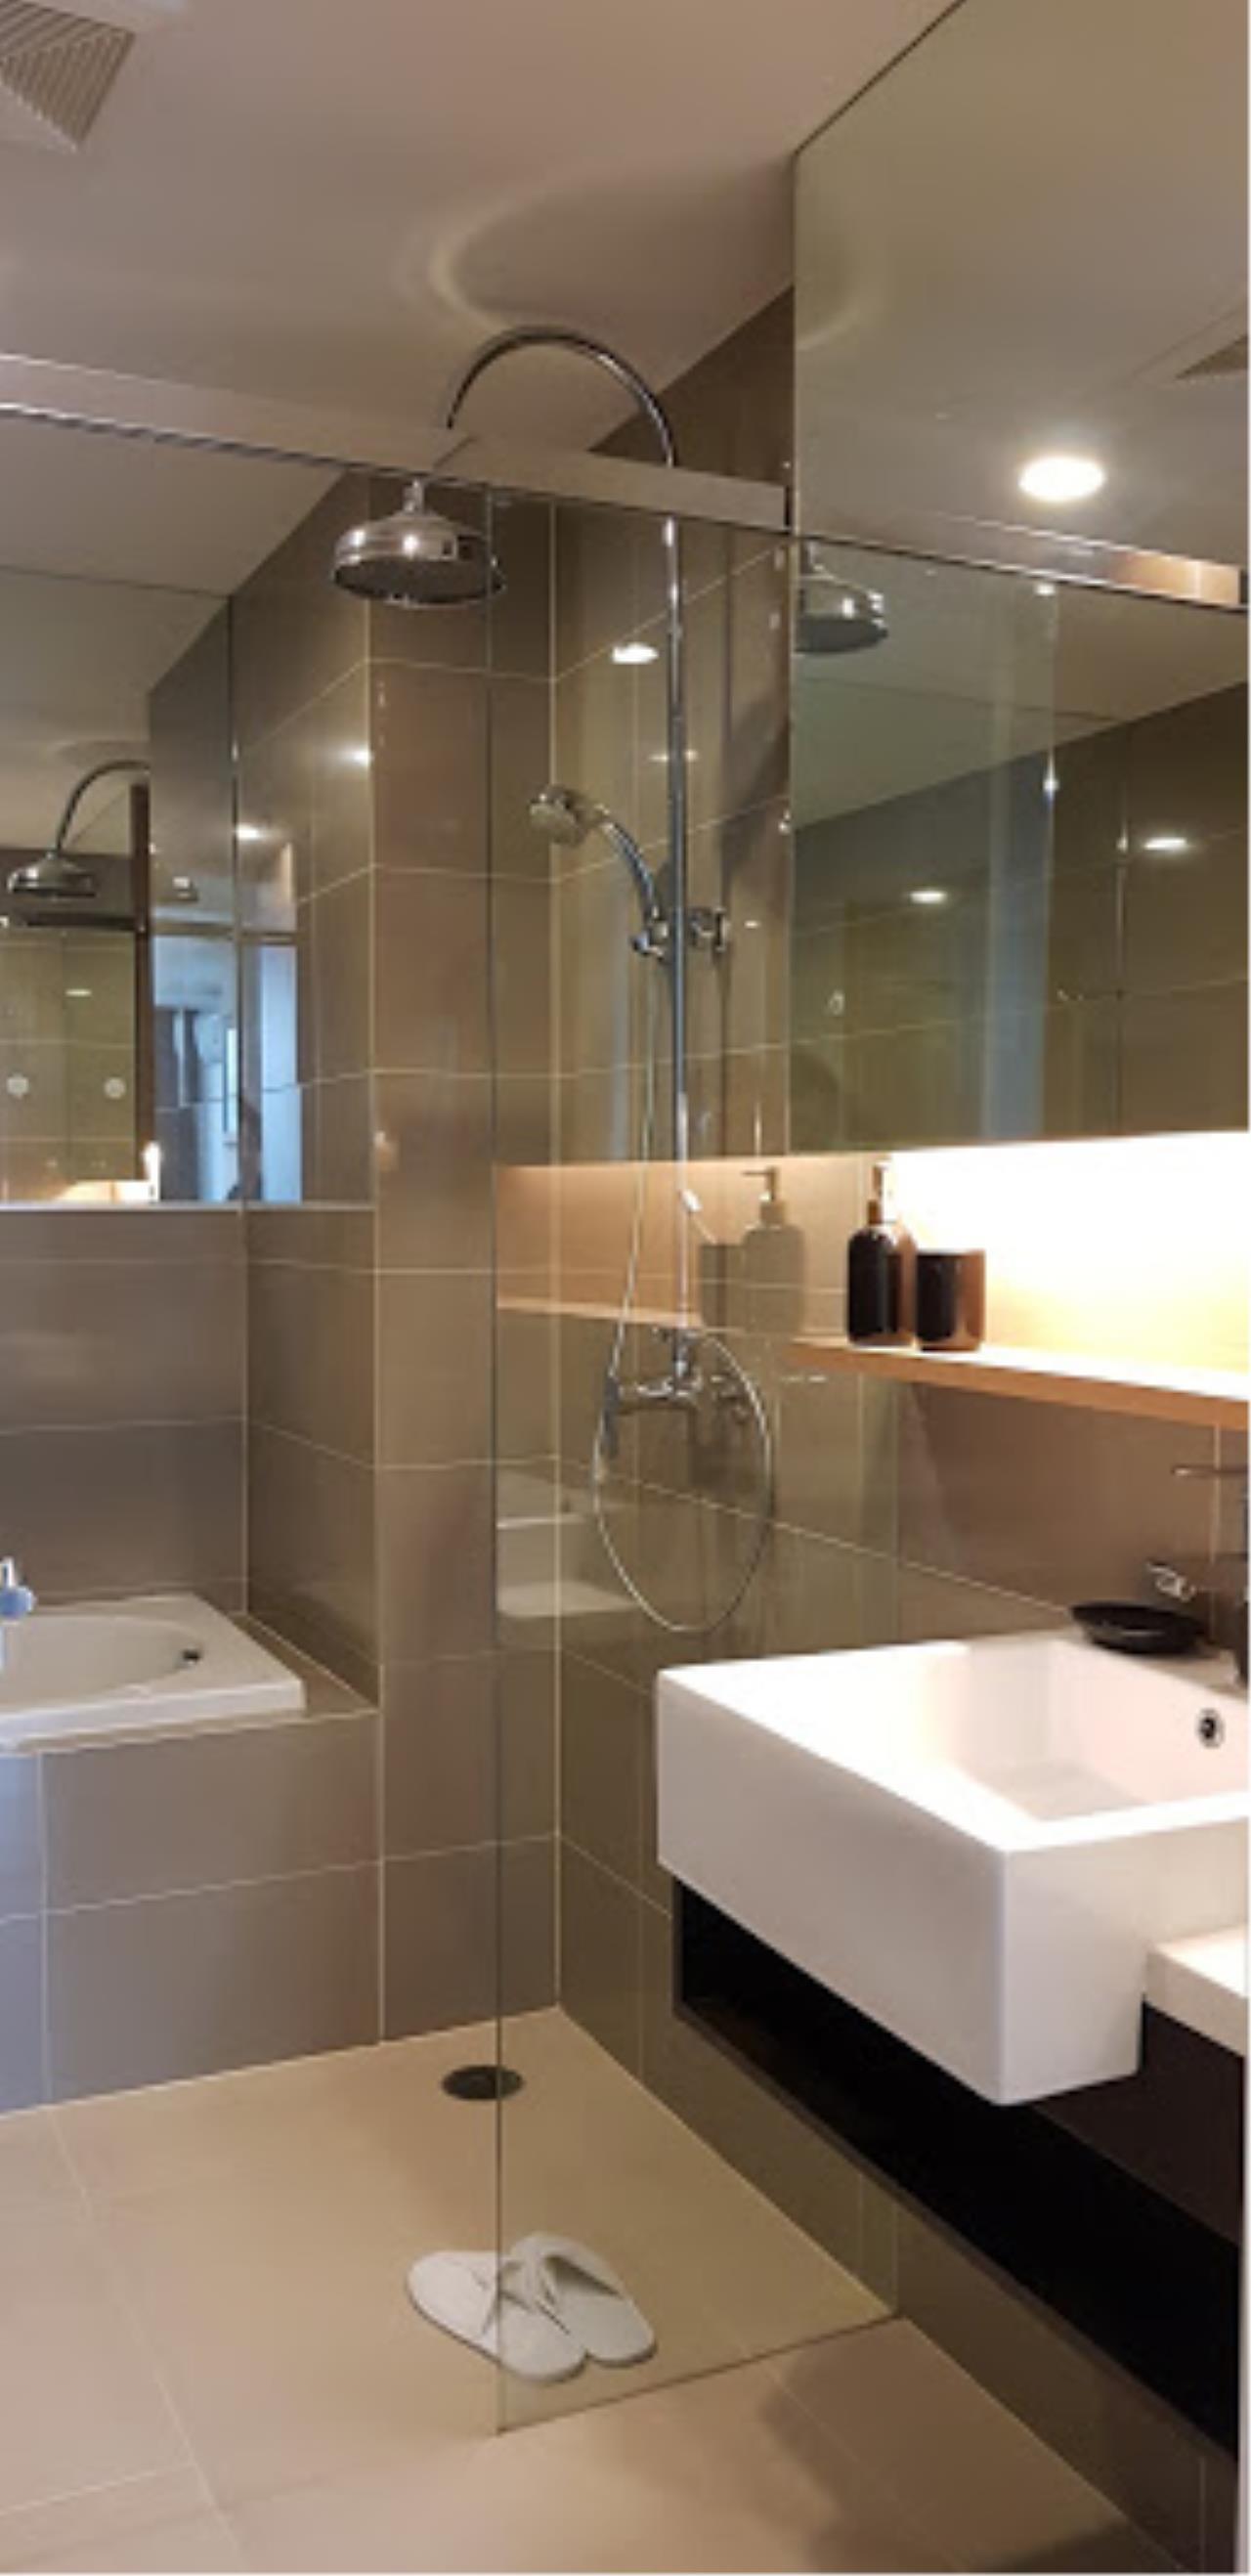 Quality Life Property Agency's S A L E & R E N T ! 15 Sukhumvit Residence | 1 BED 1 BATH | 59.29 SQ. M. 2